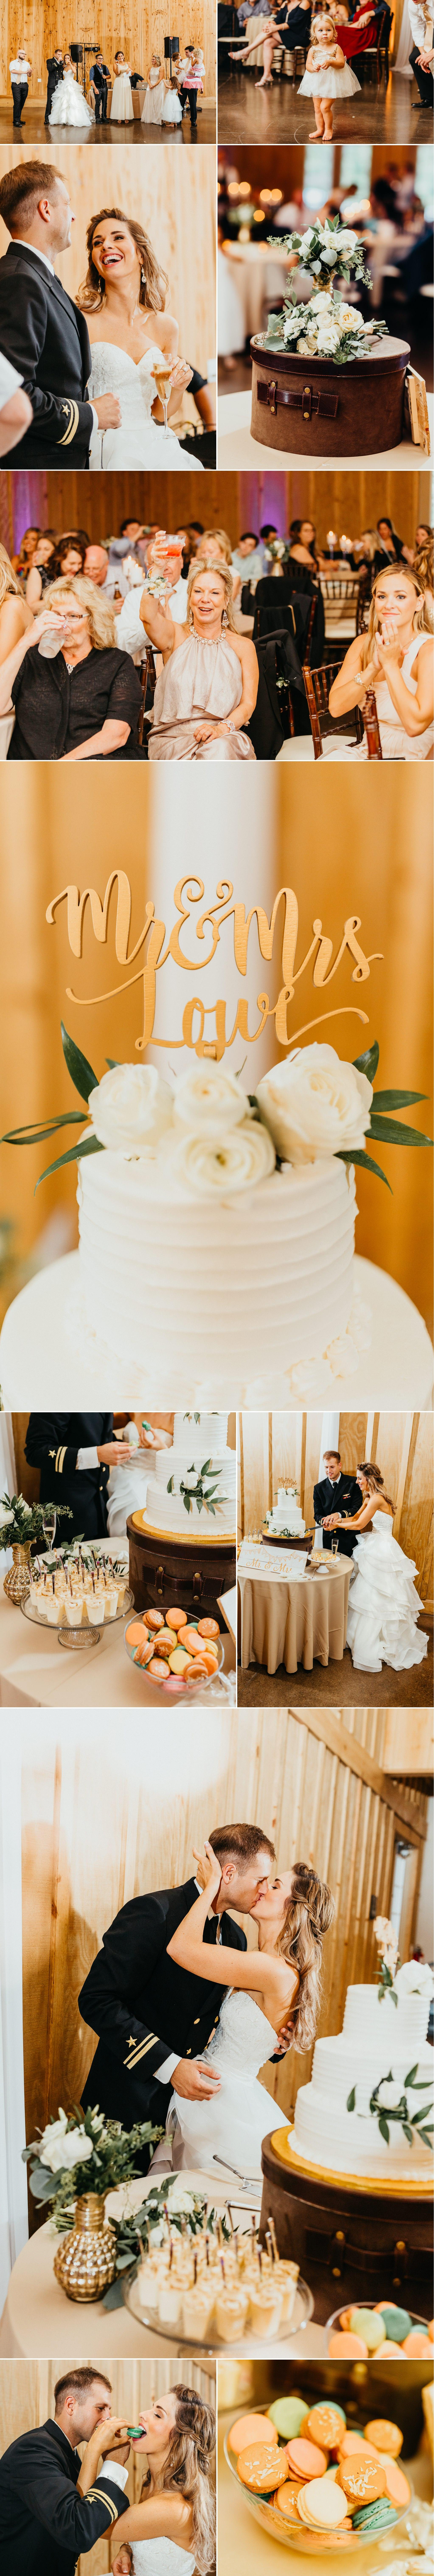 Farmhouse Chic Bowing Oaks Plantation Wedding- Orlando Photographer  16.jpg